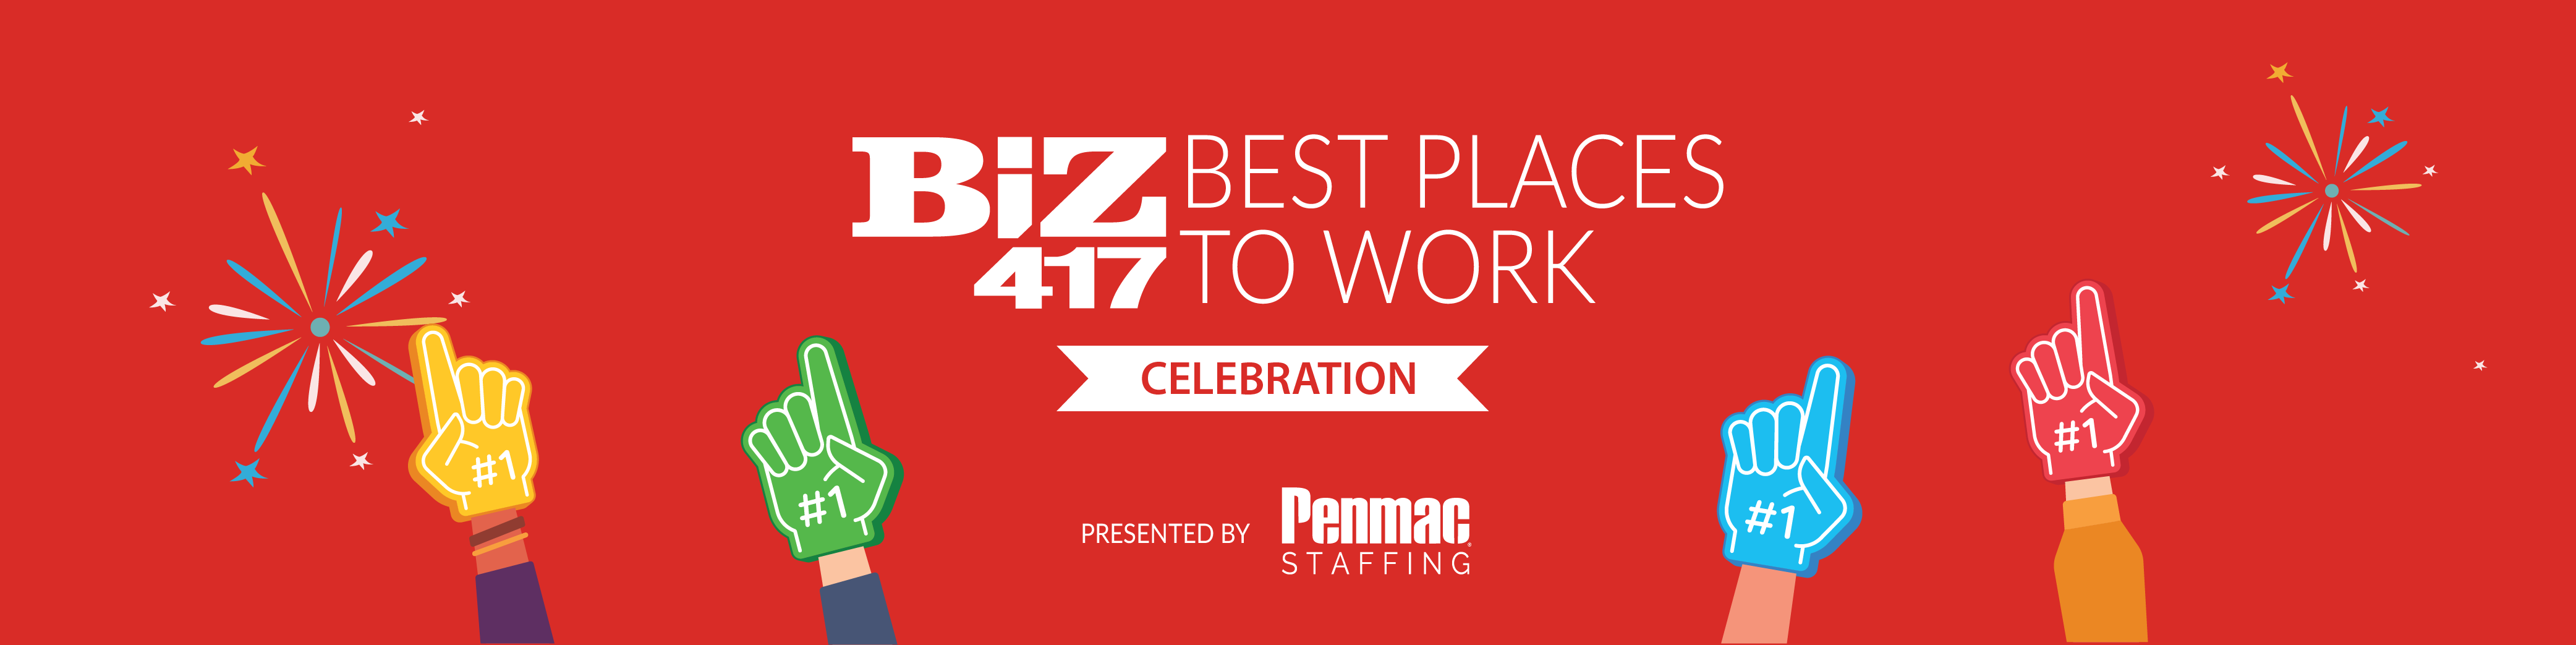 Biz 417's Best Places to Work Celebration